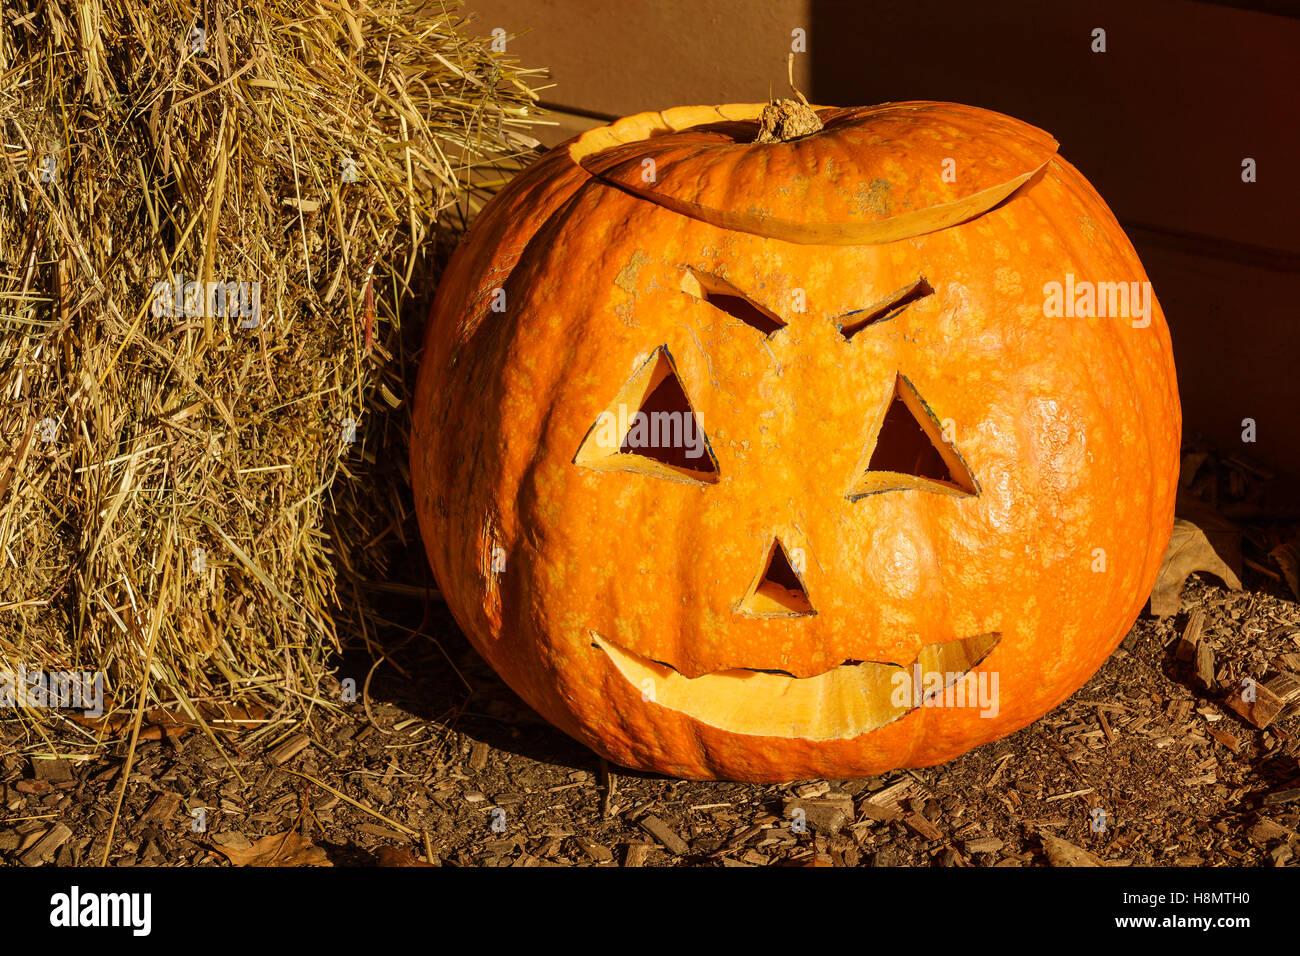 orange pumpkin with face